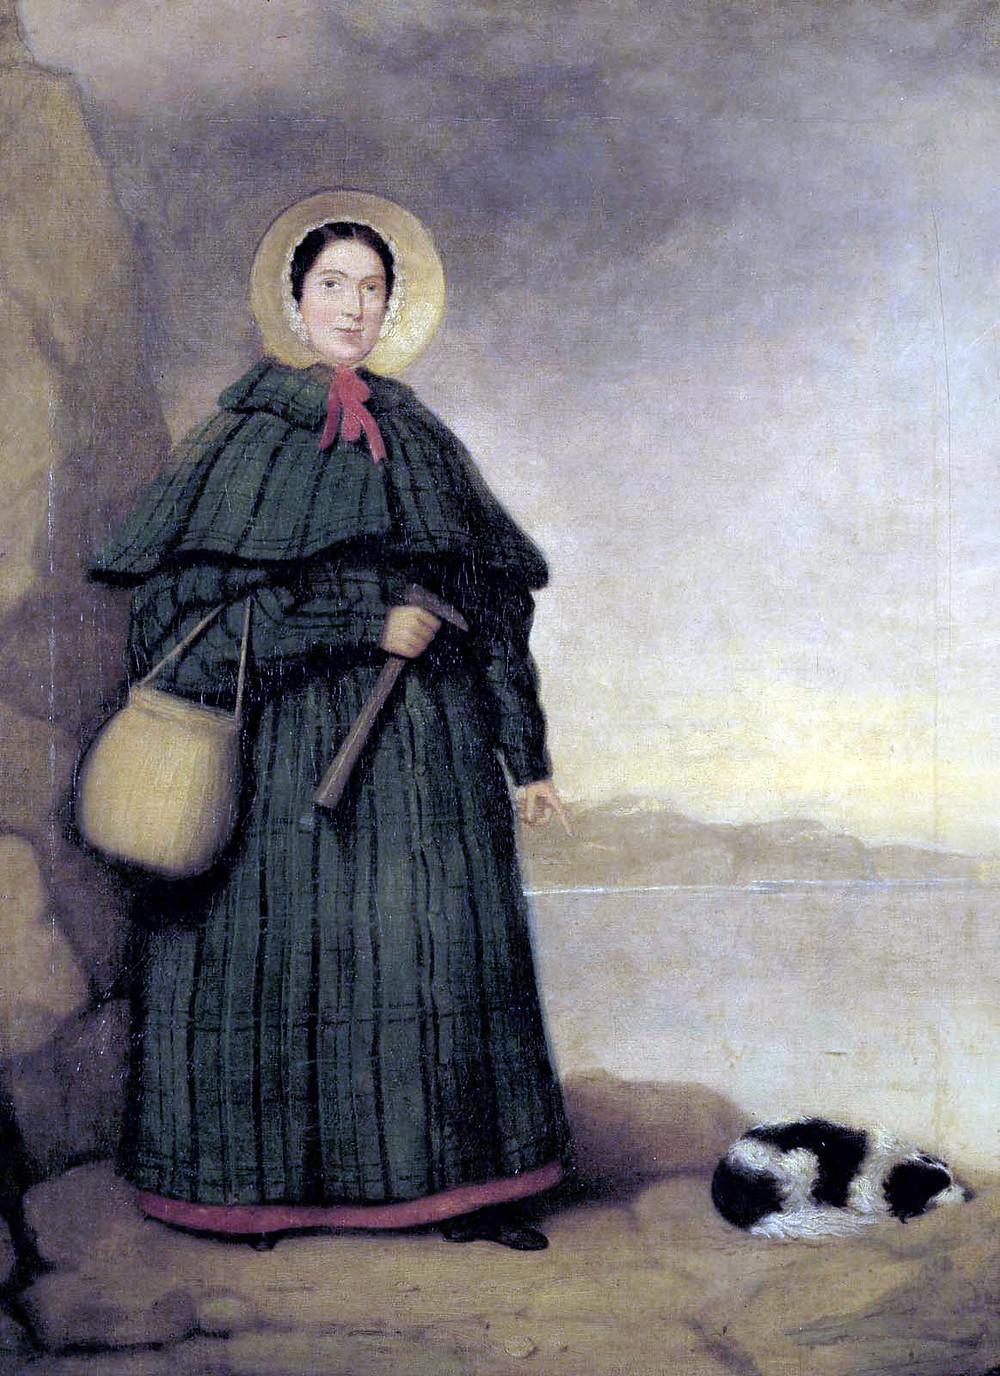 Mary Anning, female paelontologist